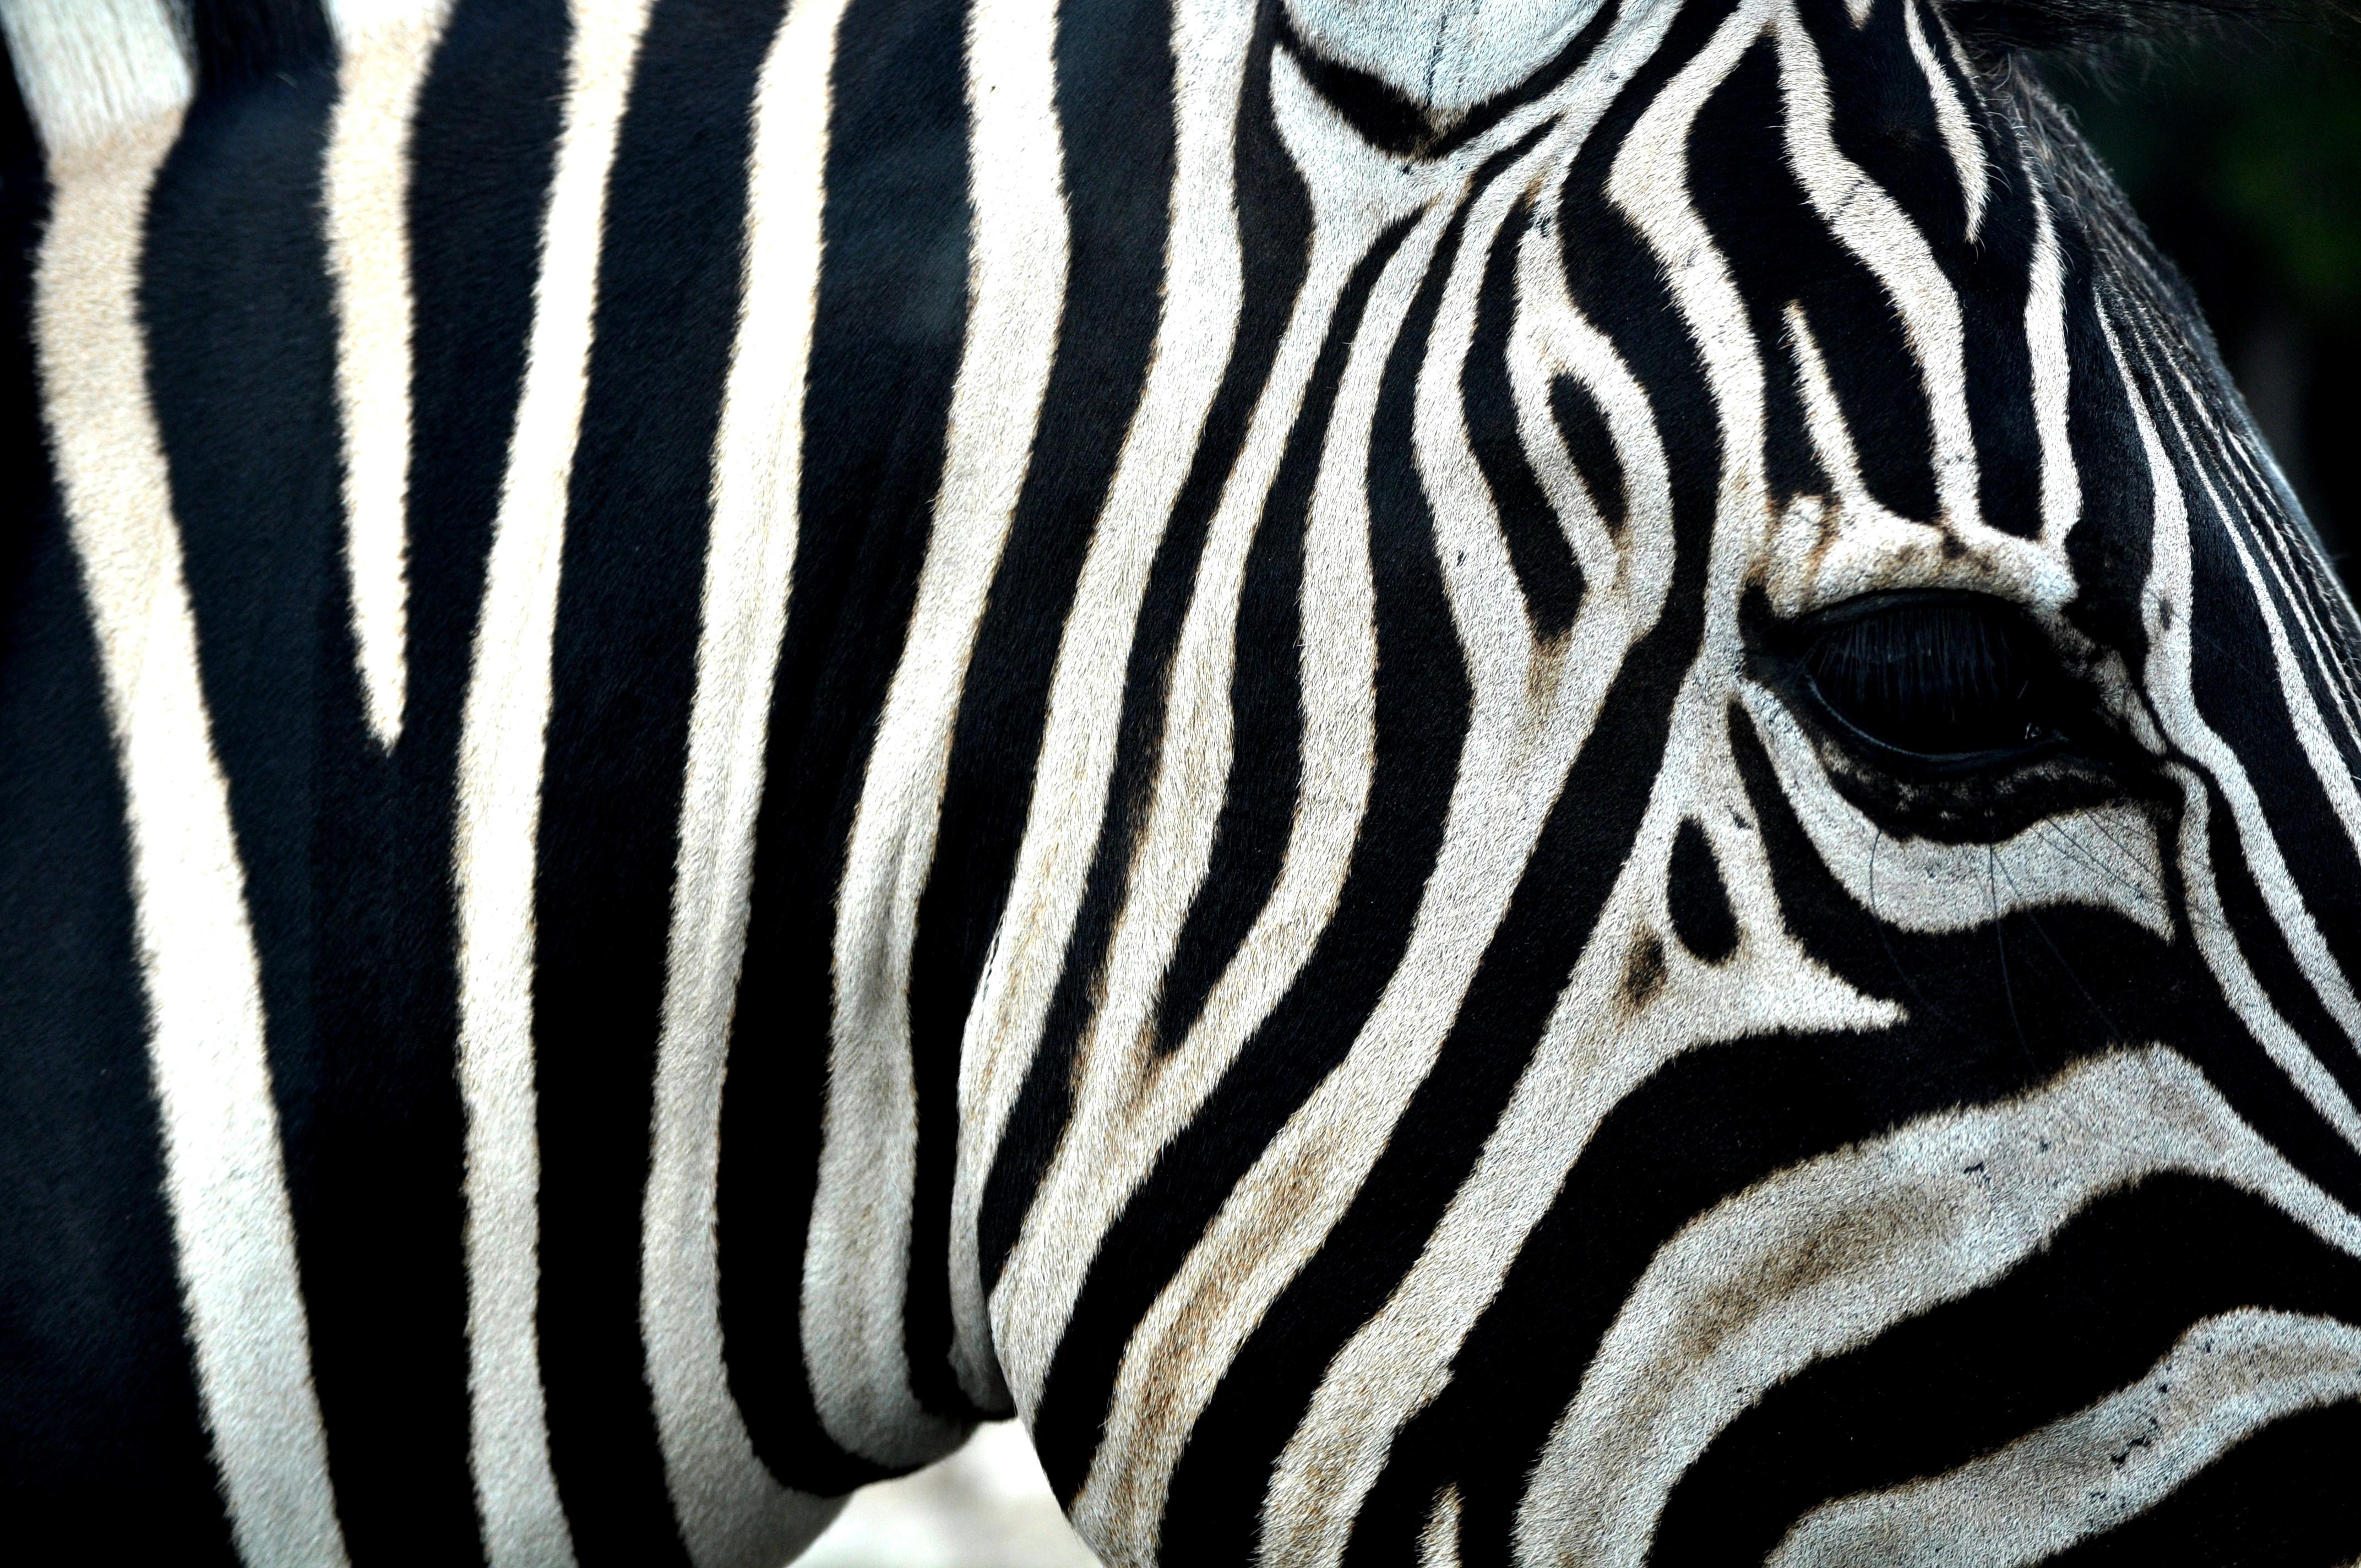 spectacular zebra stripes | Bruce Fong's Blog